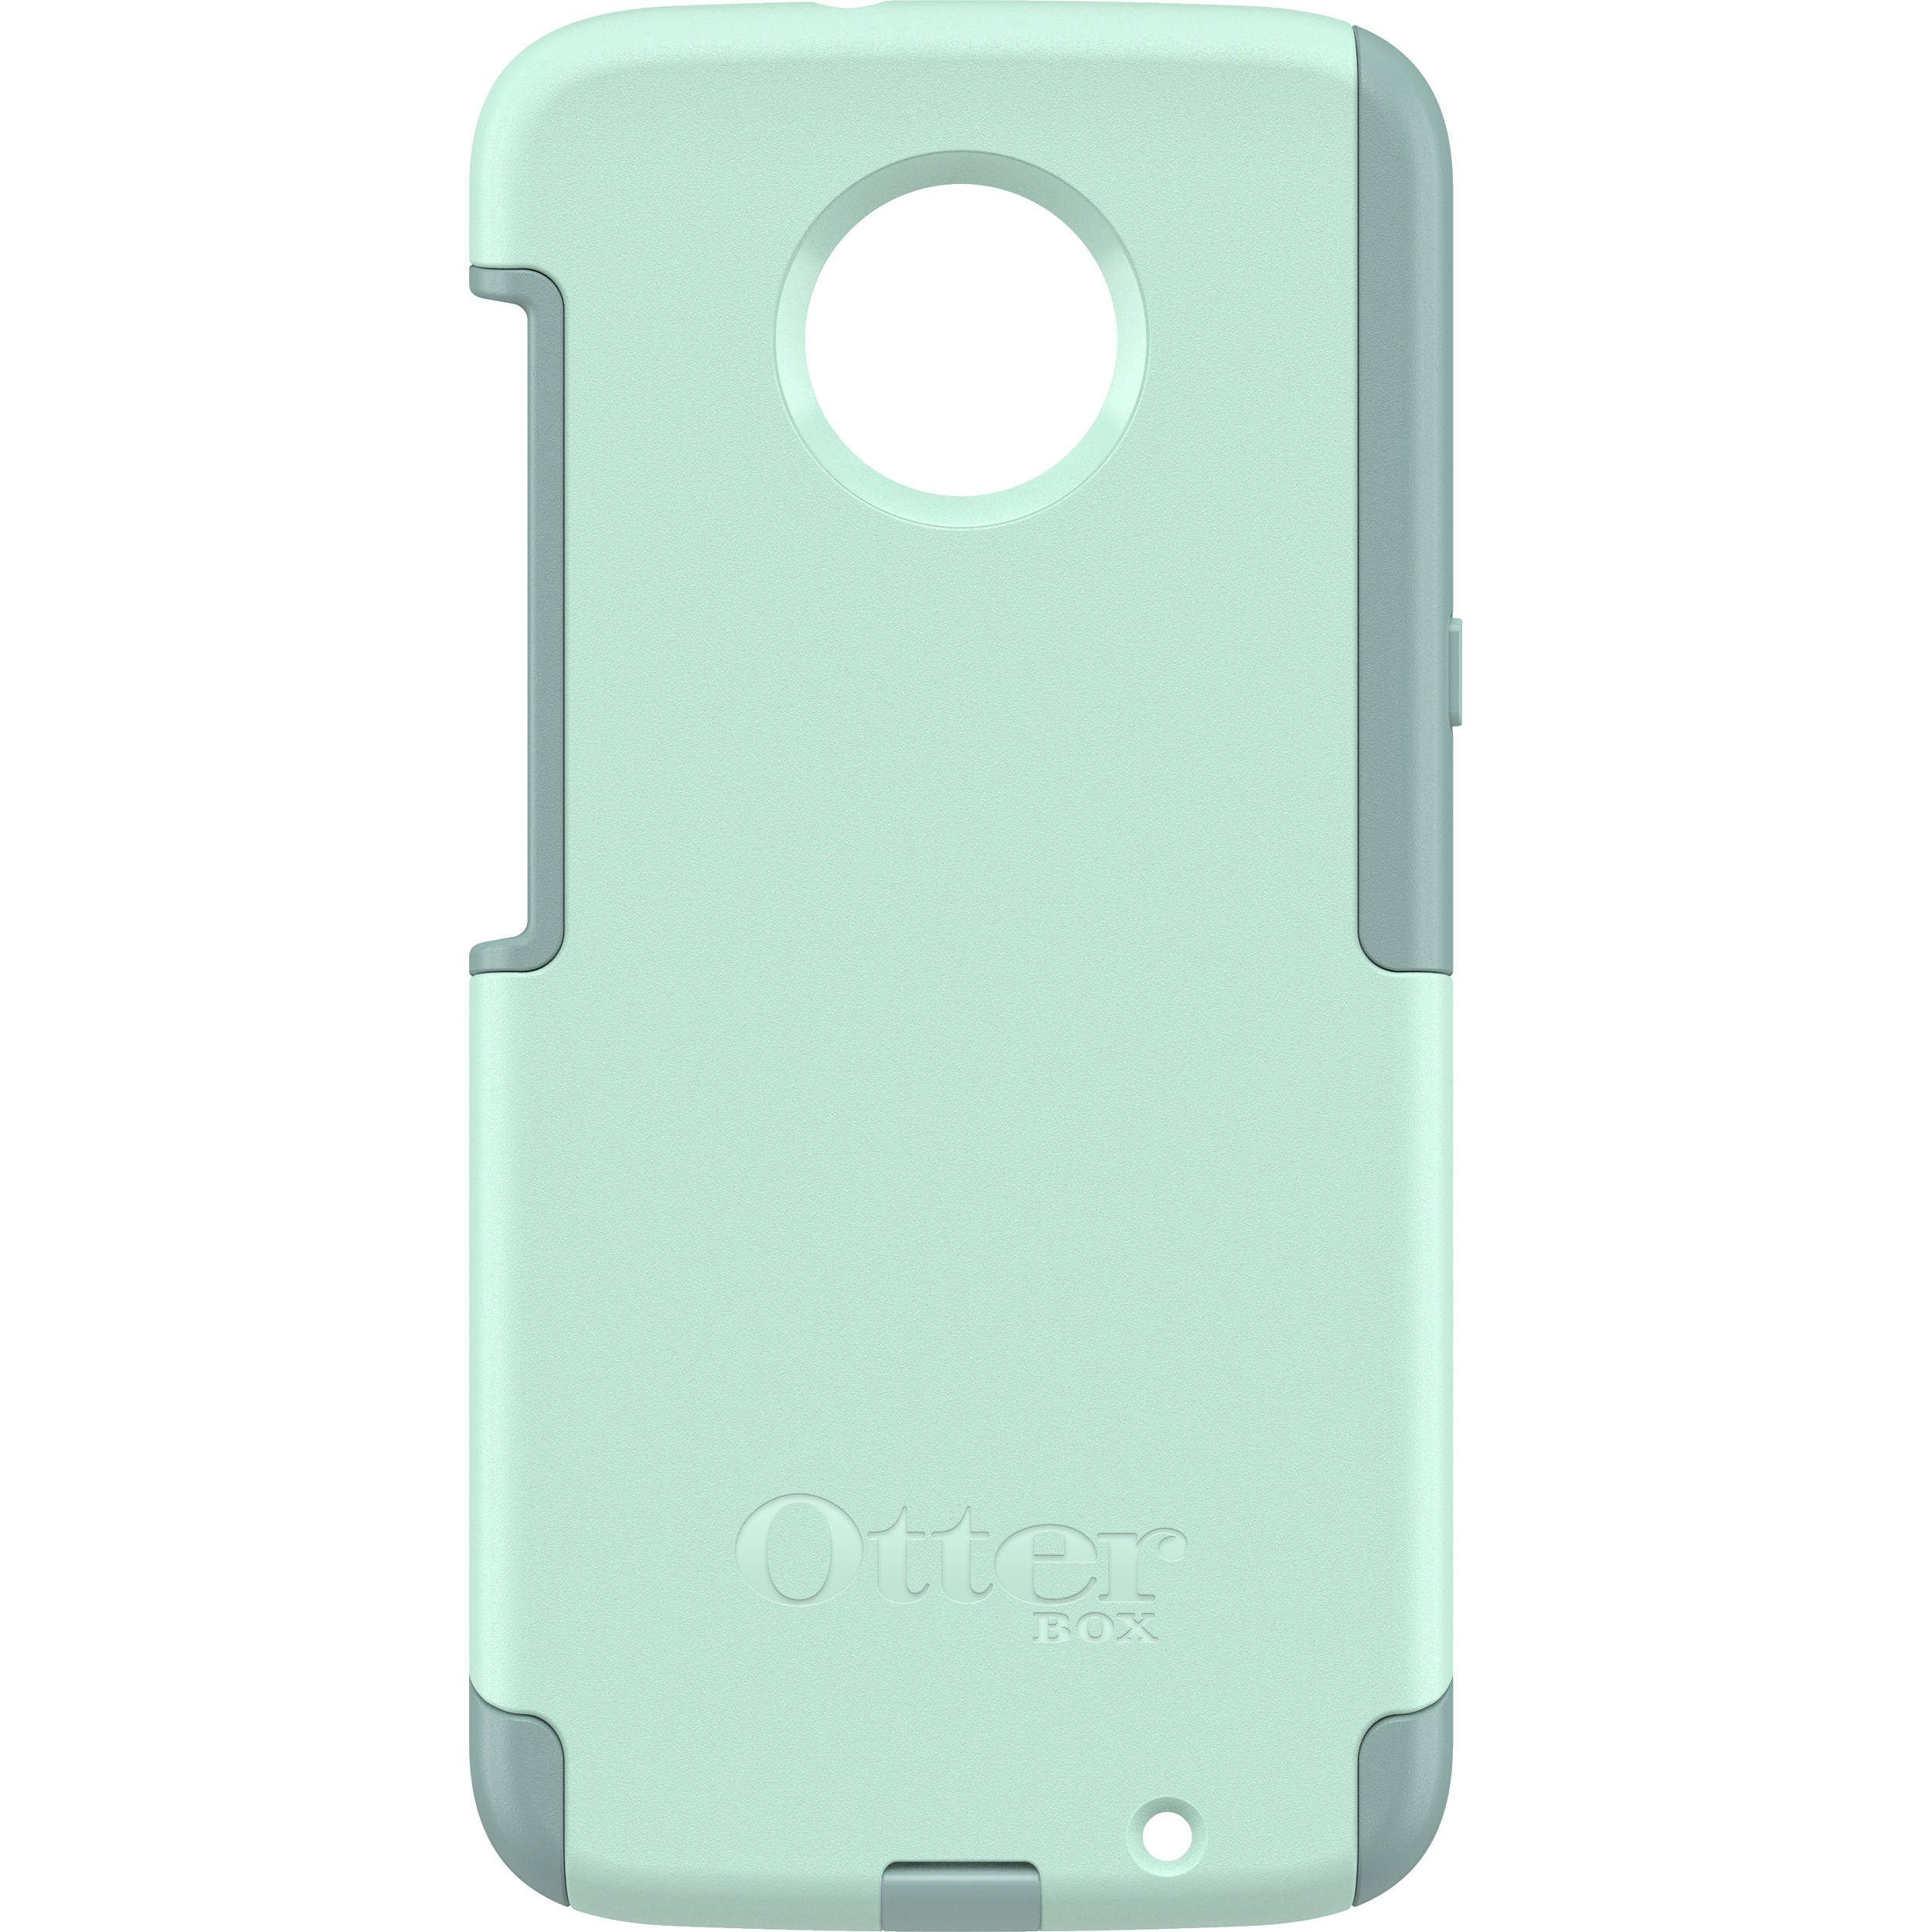 huge discount 0d181 e9473 OtterBox Commuter Case for Moto Z3 Play (Ocean Way Blue)